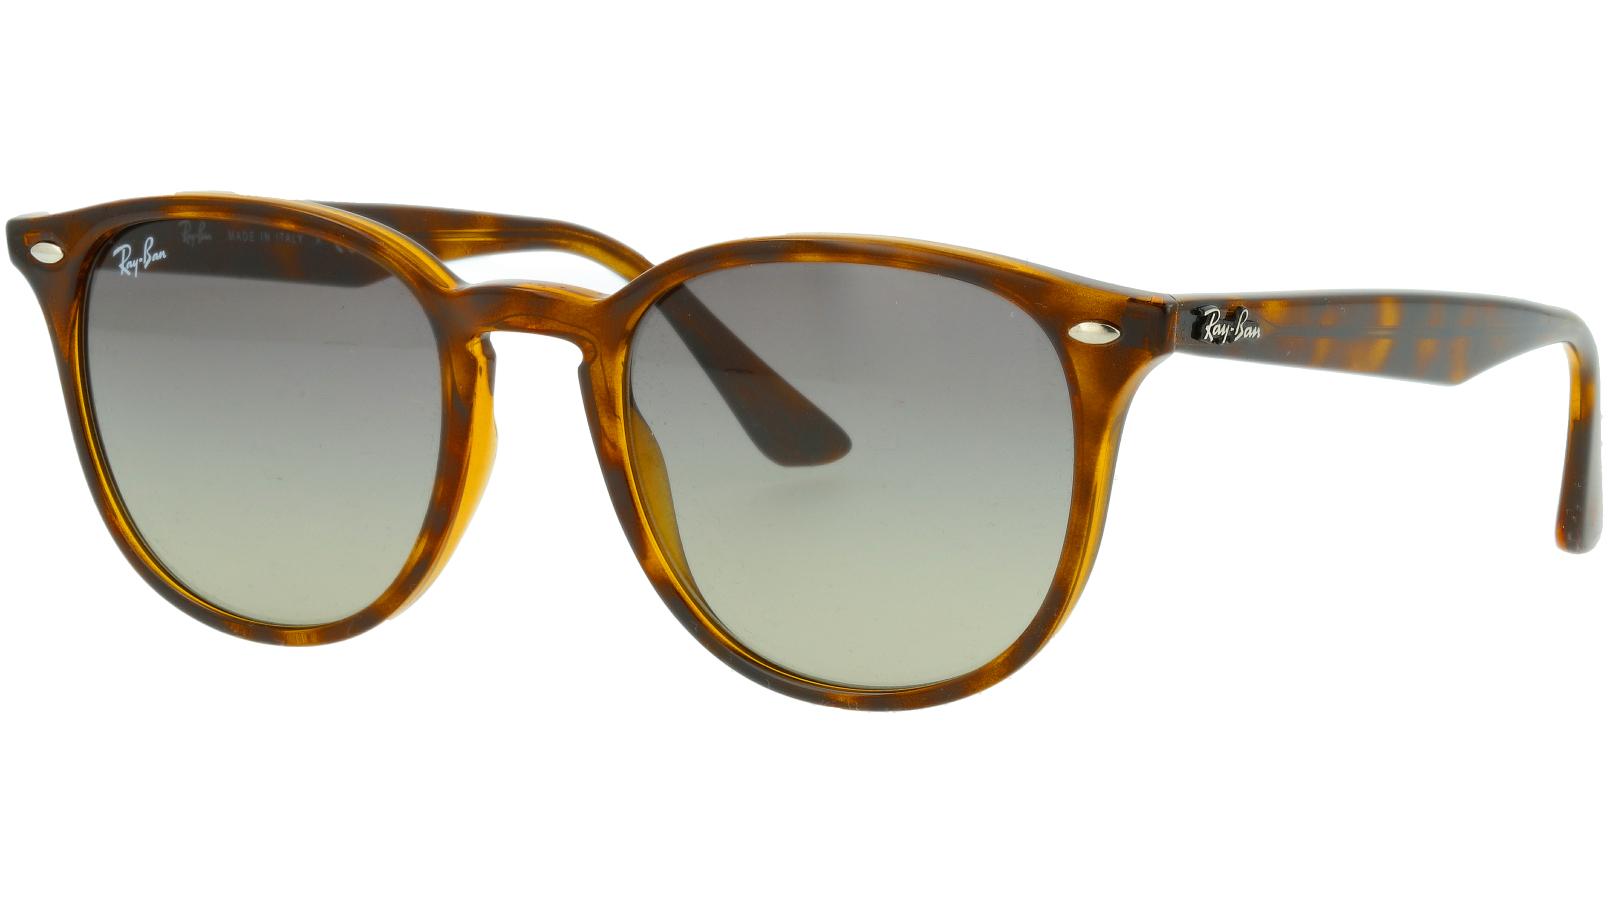 Ray-Ban RB4259 710/11 51 LIGHT Sunglasses